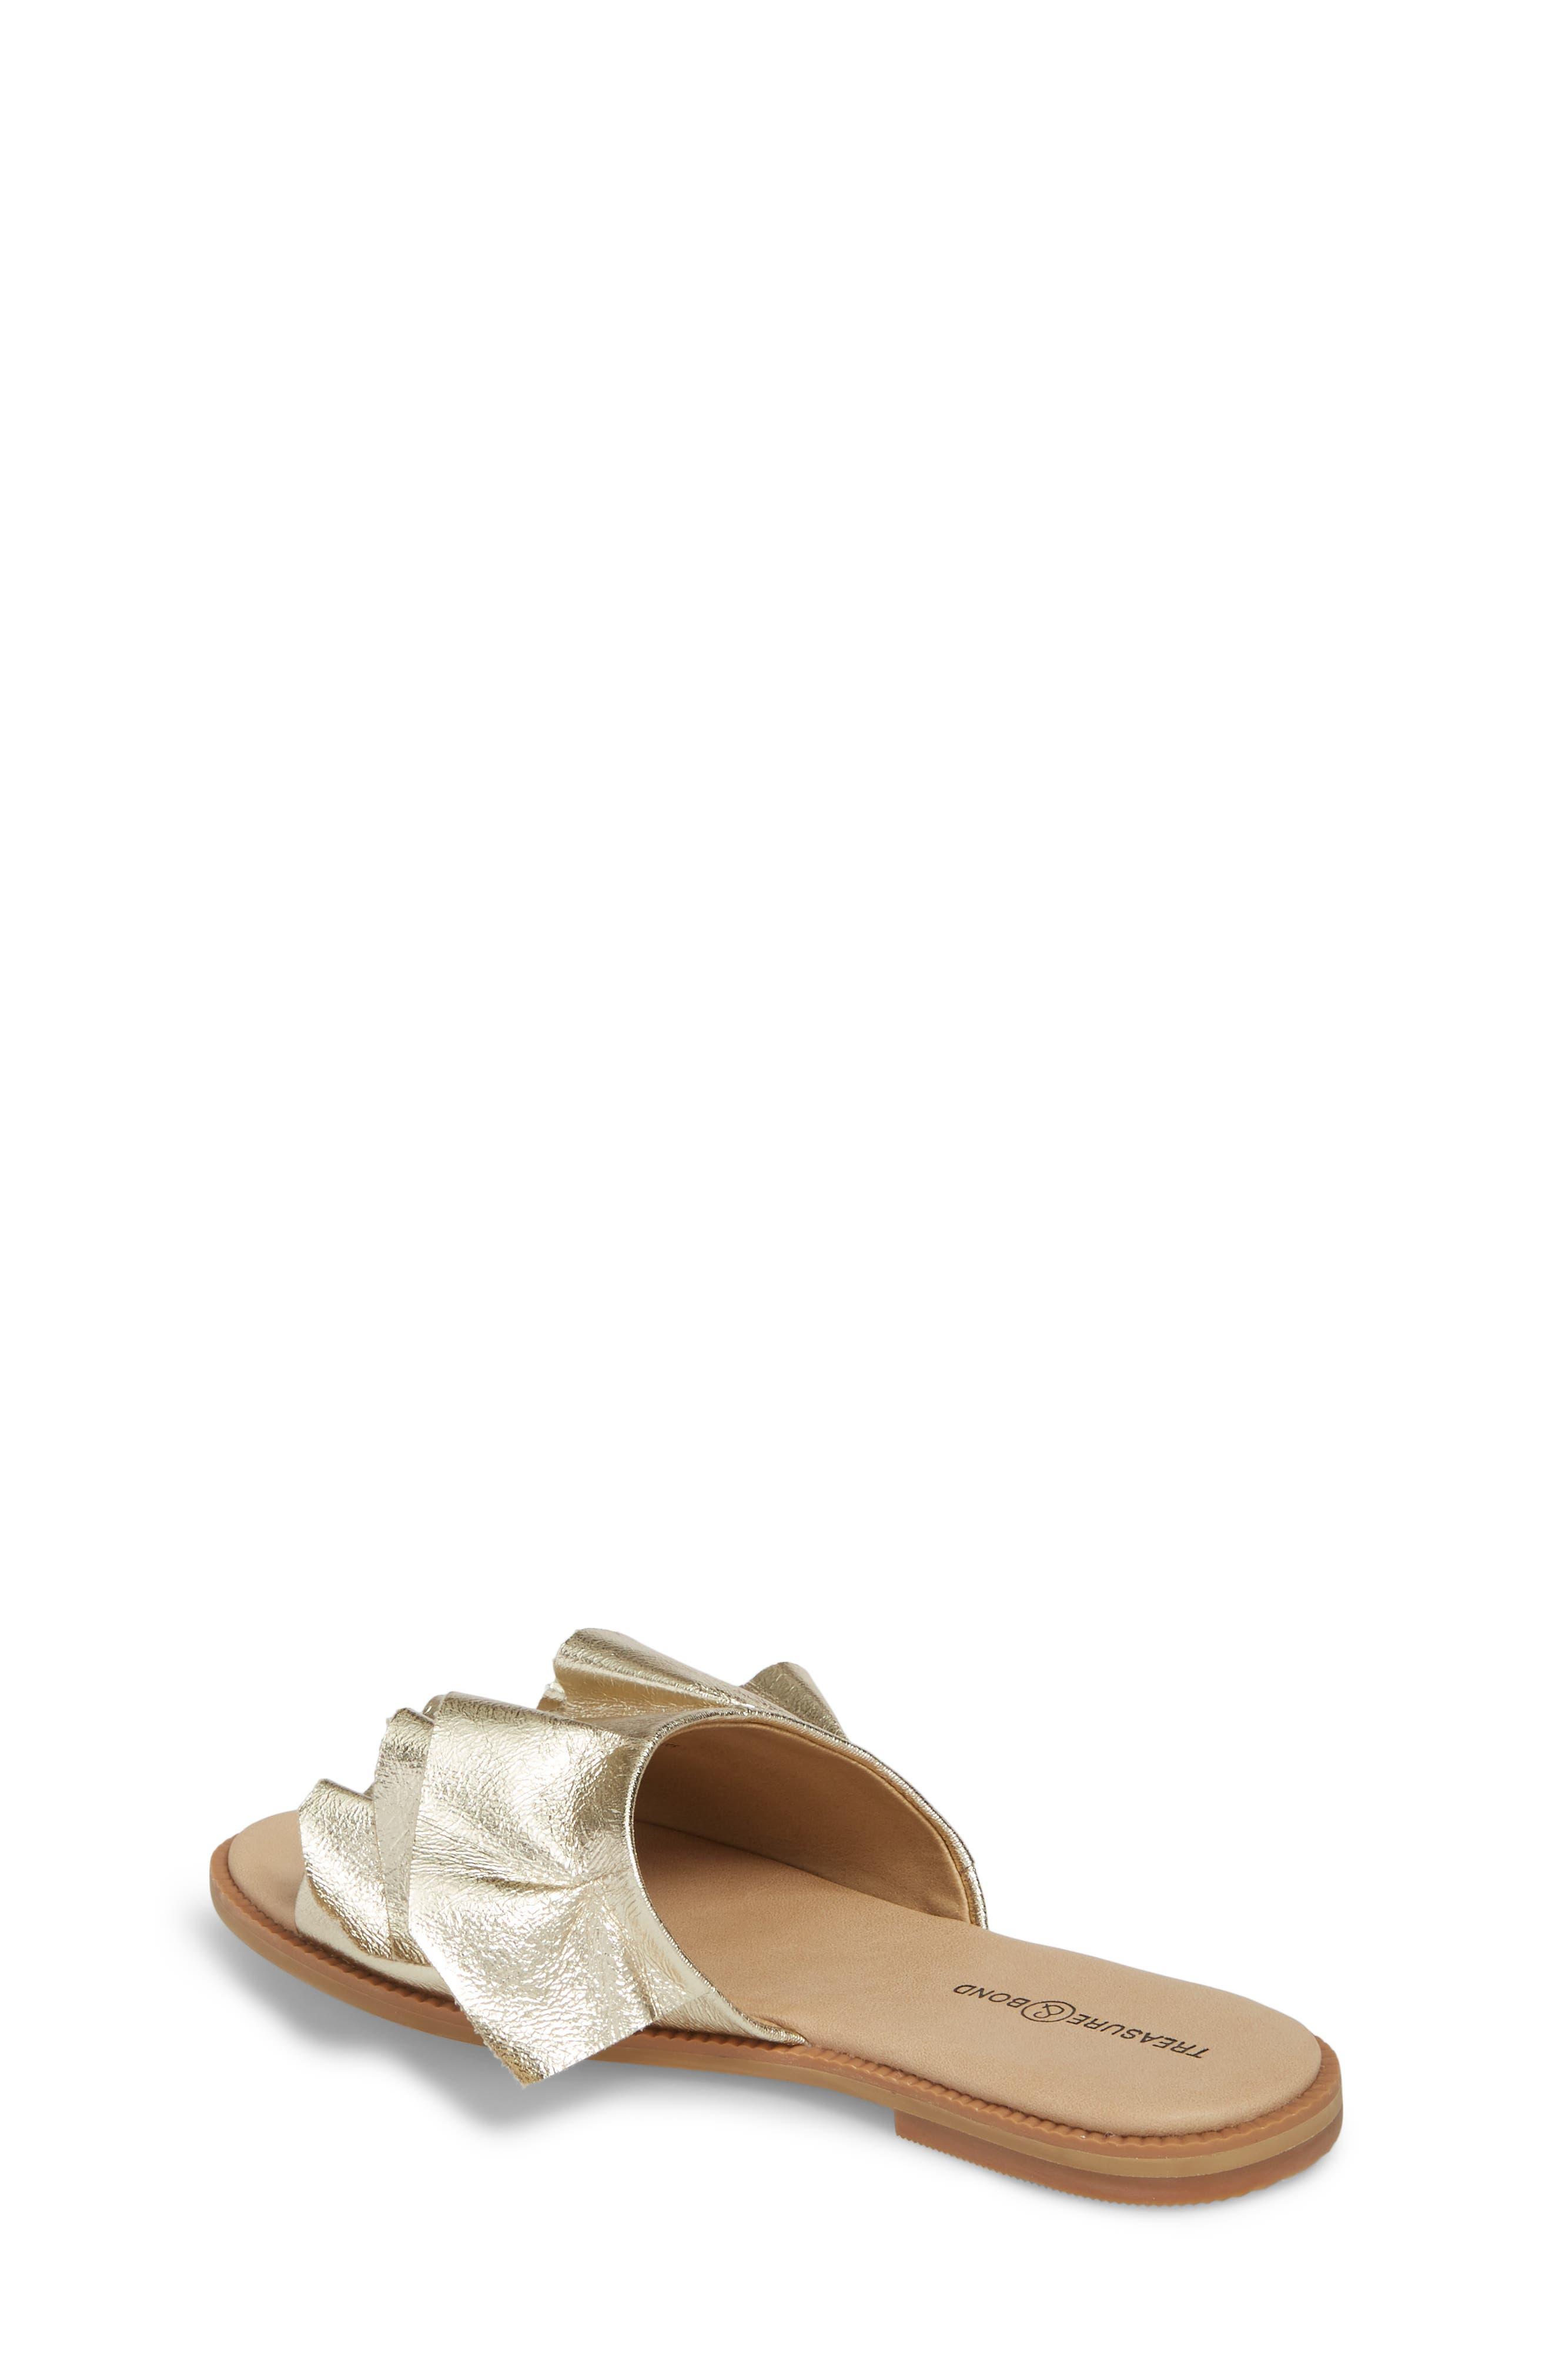 Ruby Ruffled Slide Sandal,                             Alternate thumbnail 2, color,                             Gold Crackle Faux Leather